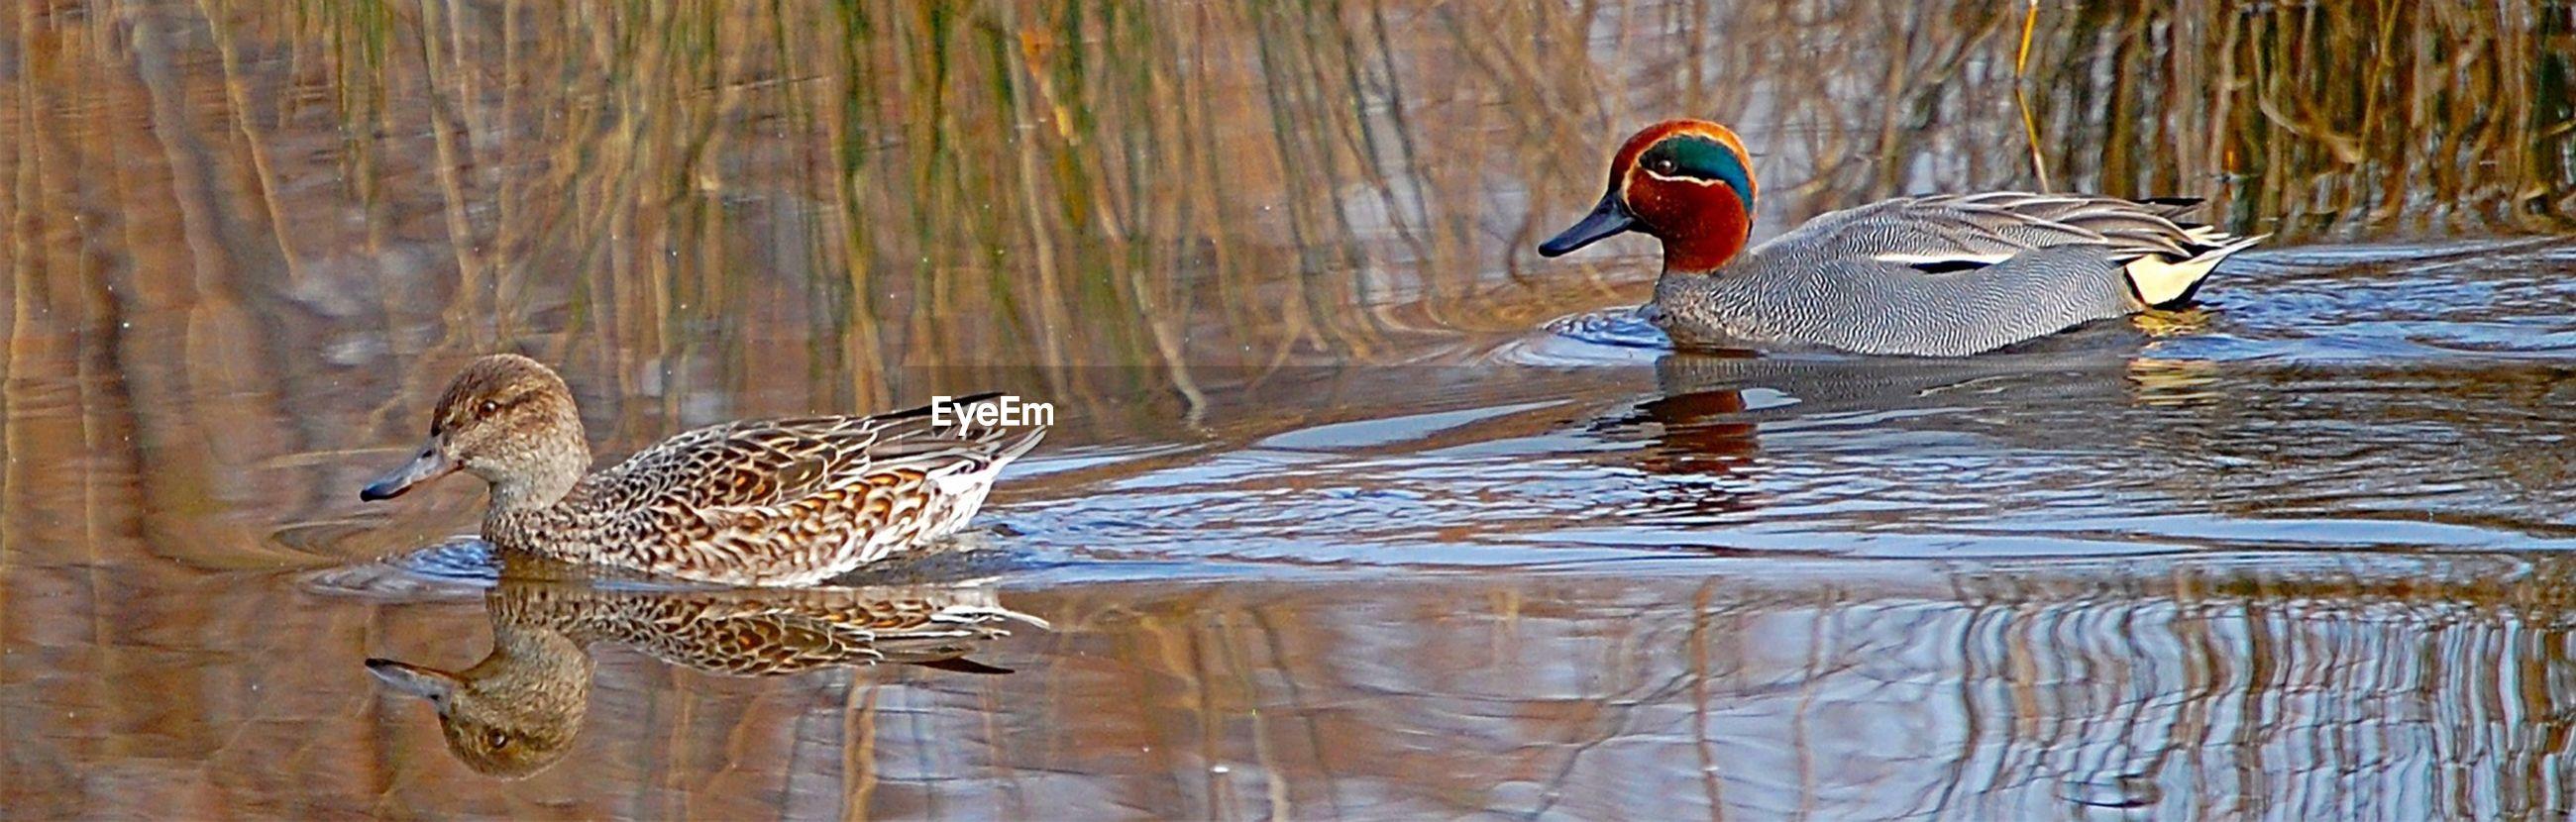 animal themes, animals in the wild, bird, wildlife, water, lake, swimming, waterfront, duck, one animal, rippled, reflection, nature, beak, water bird, outdoors, no people, two animals, day, swan